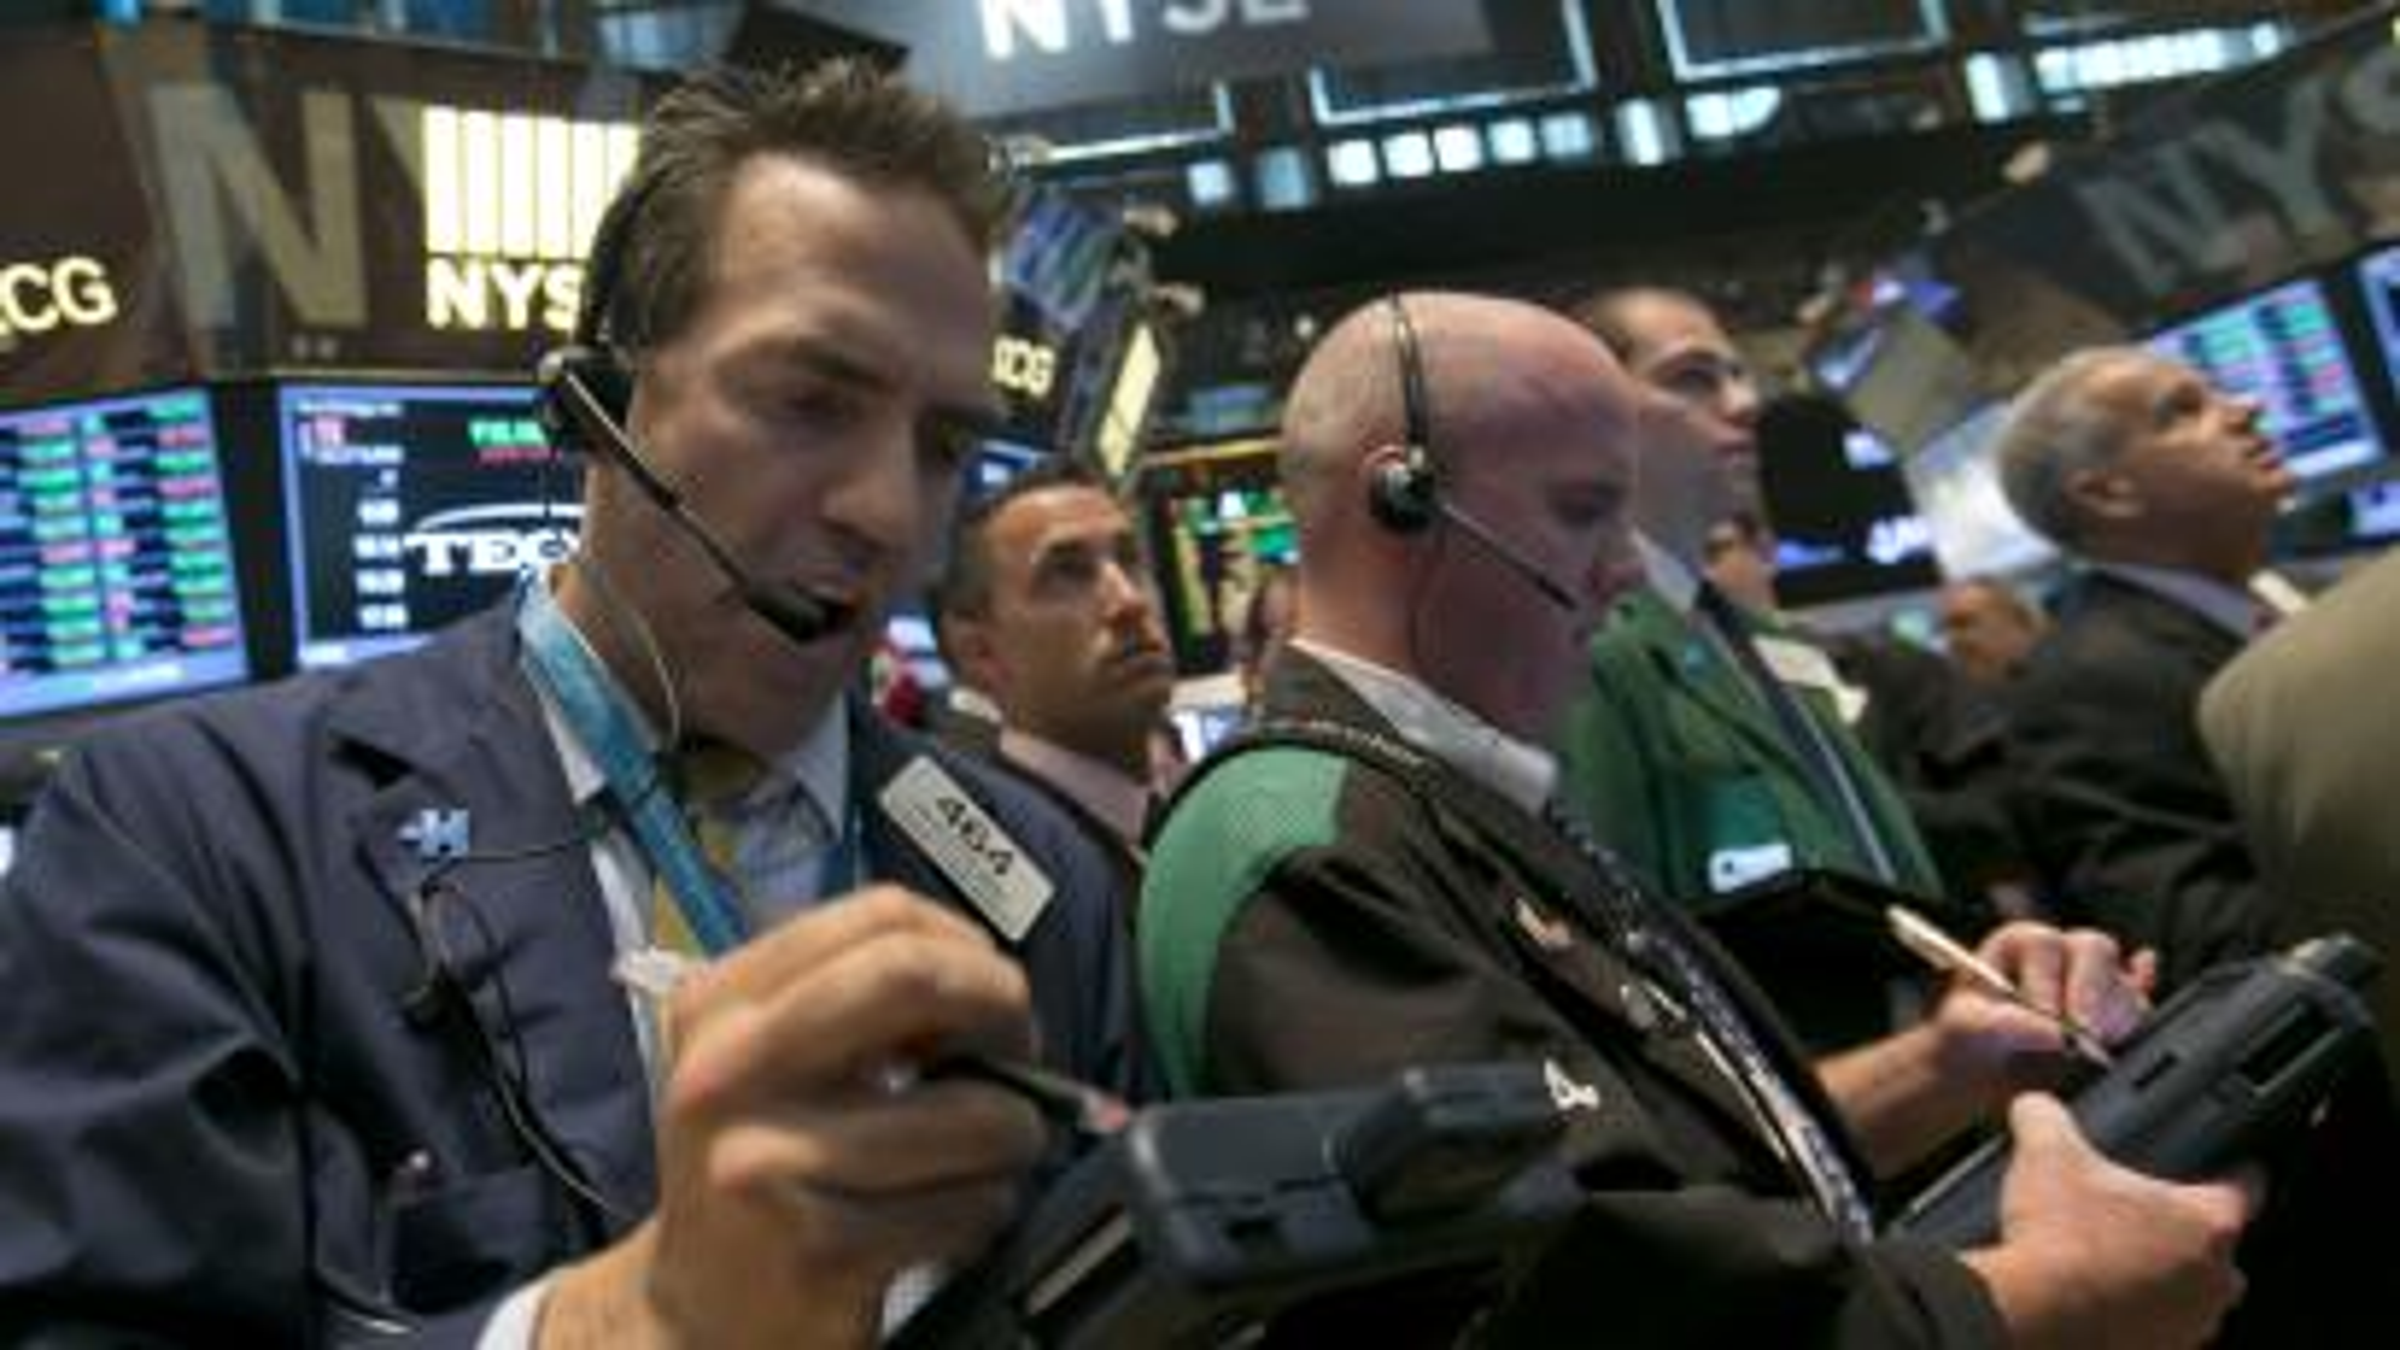 Traders at stock market